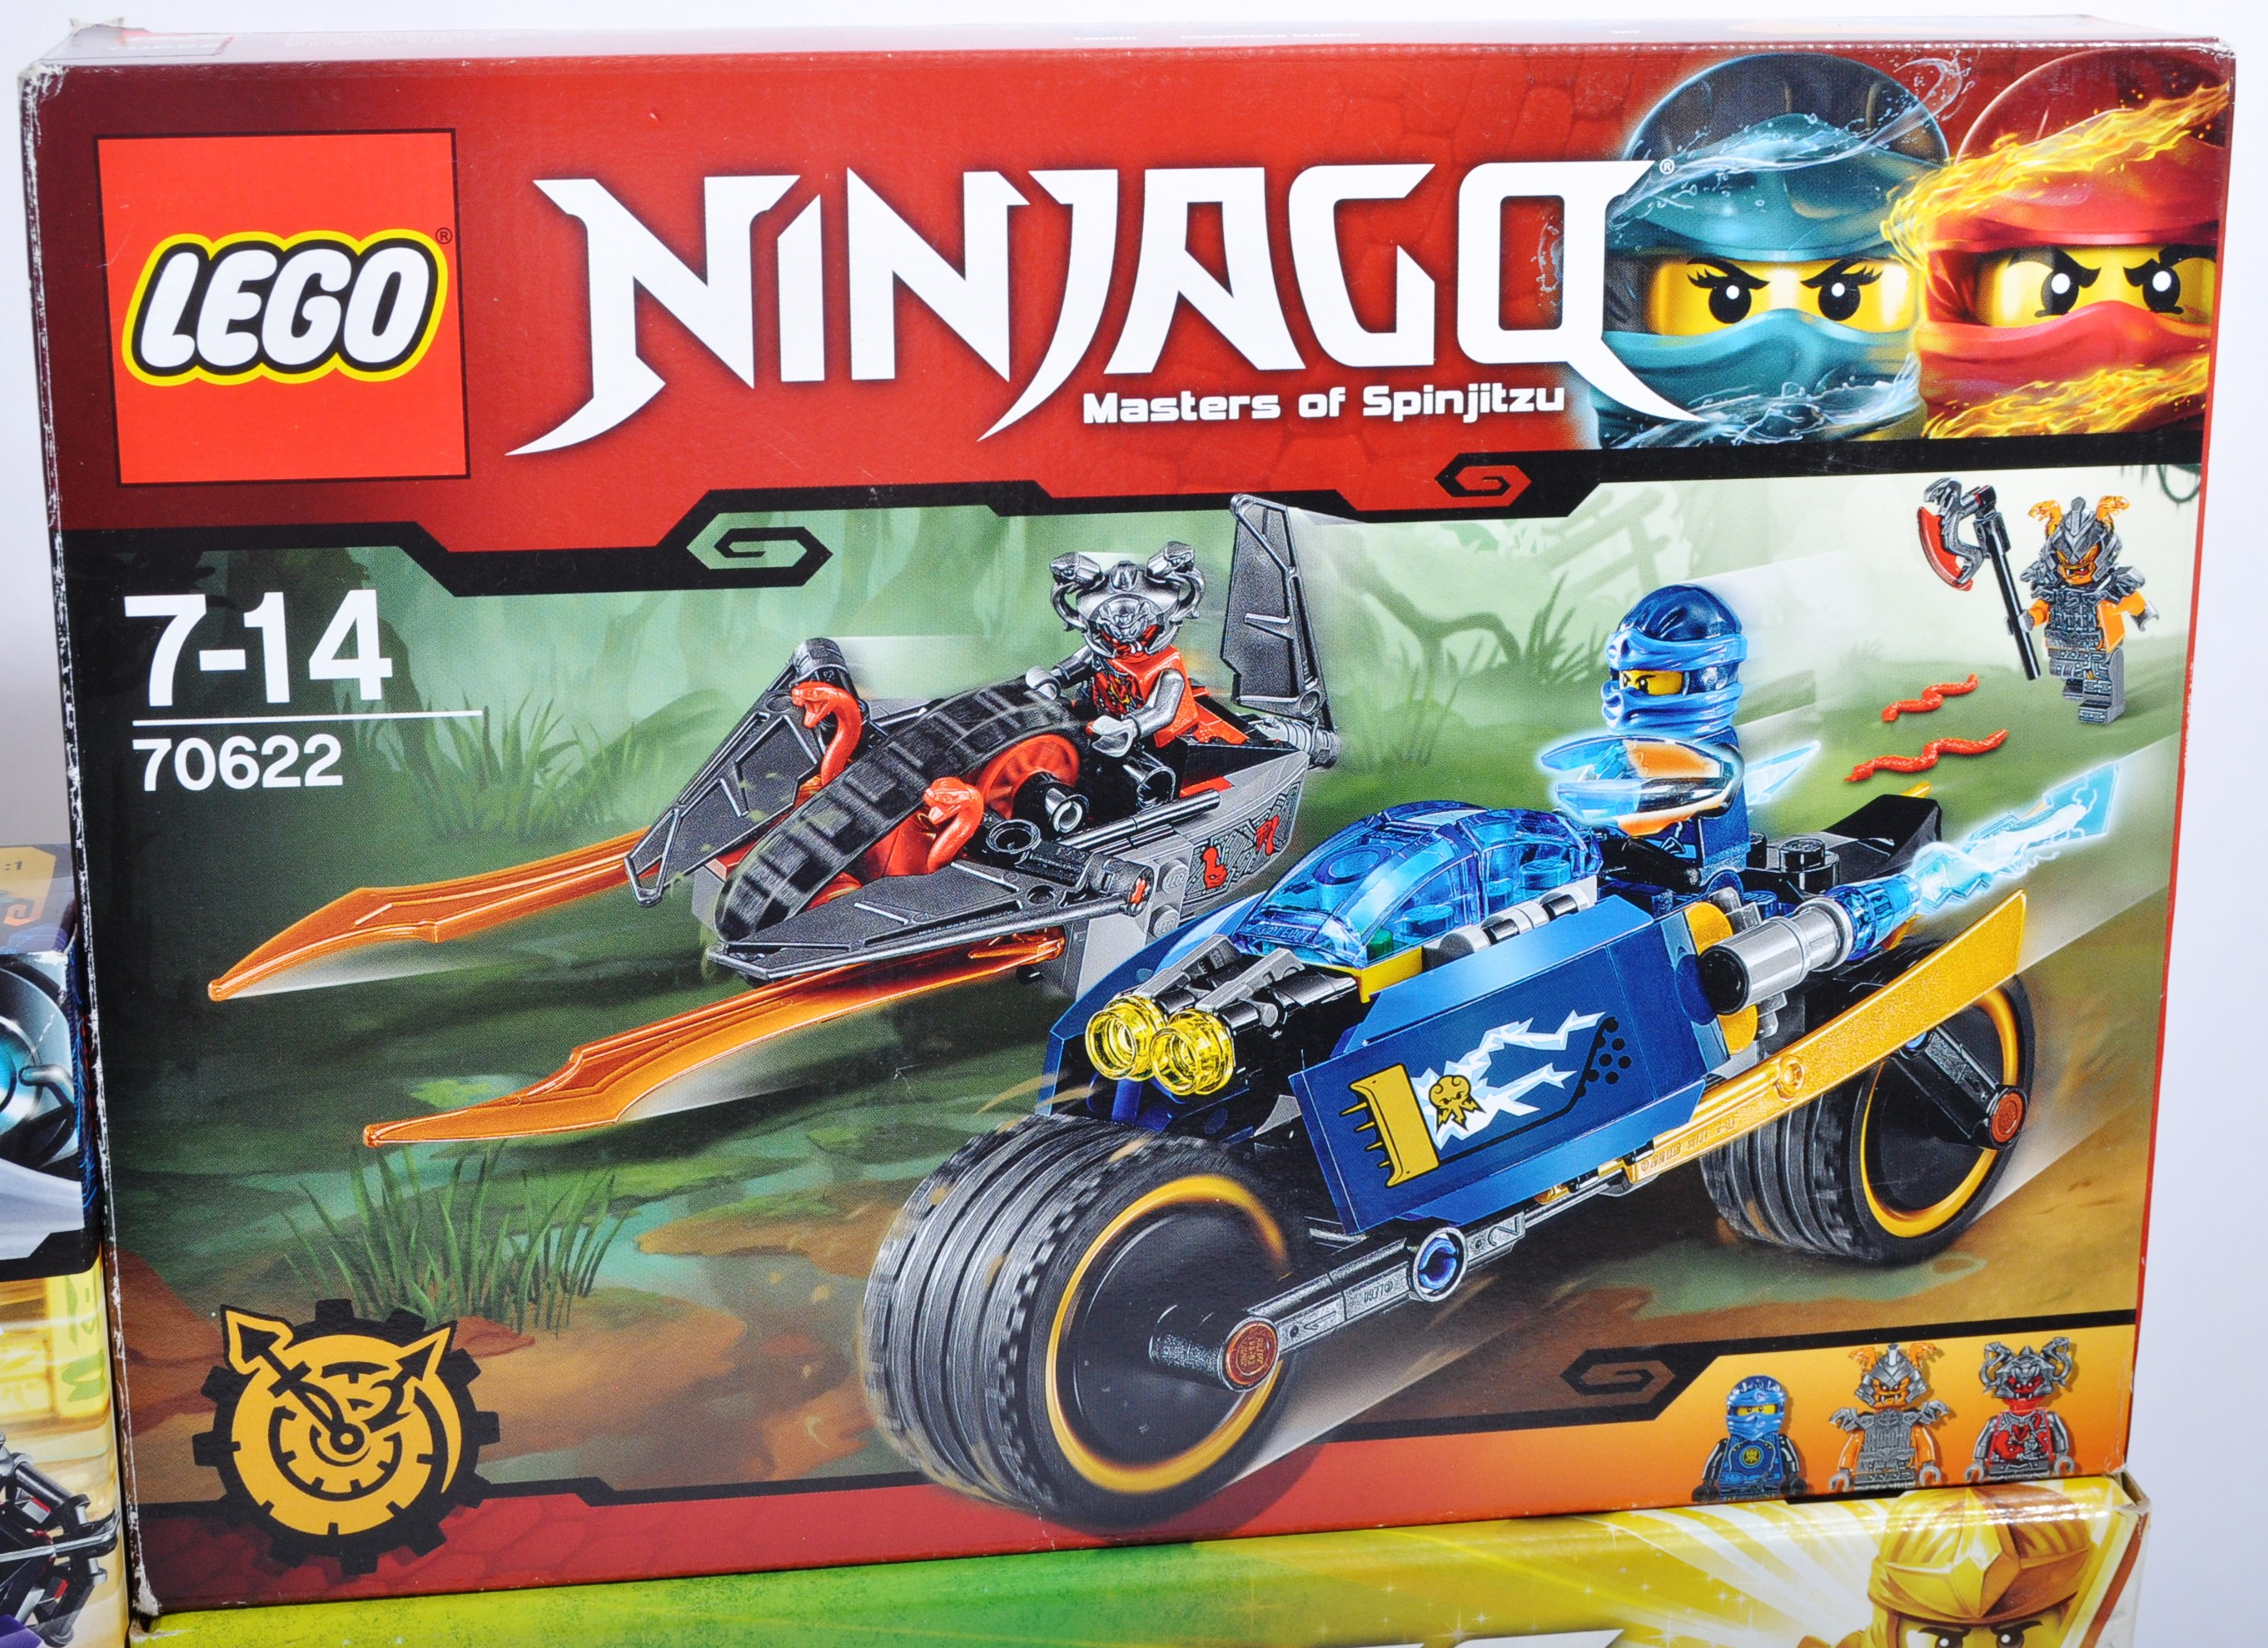 LEGO SETS - LEGO NINJAGO - COLLECTION OF X8 LEGO NINJAGO SETS - Image 5 of 9